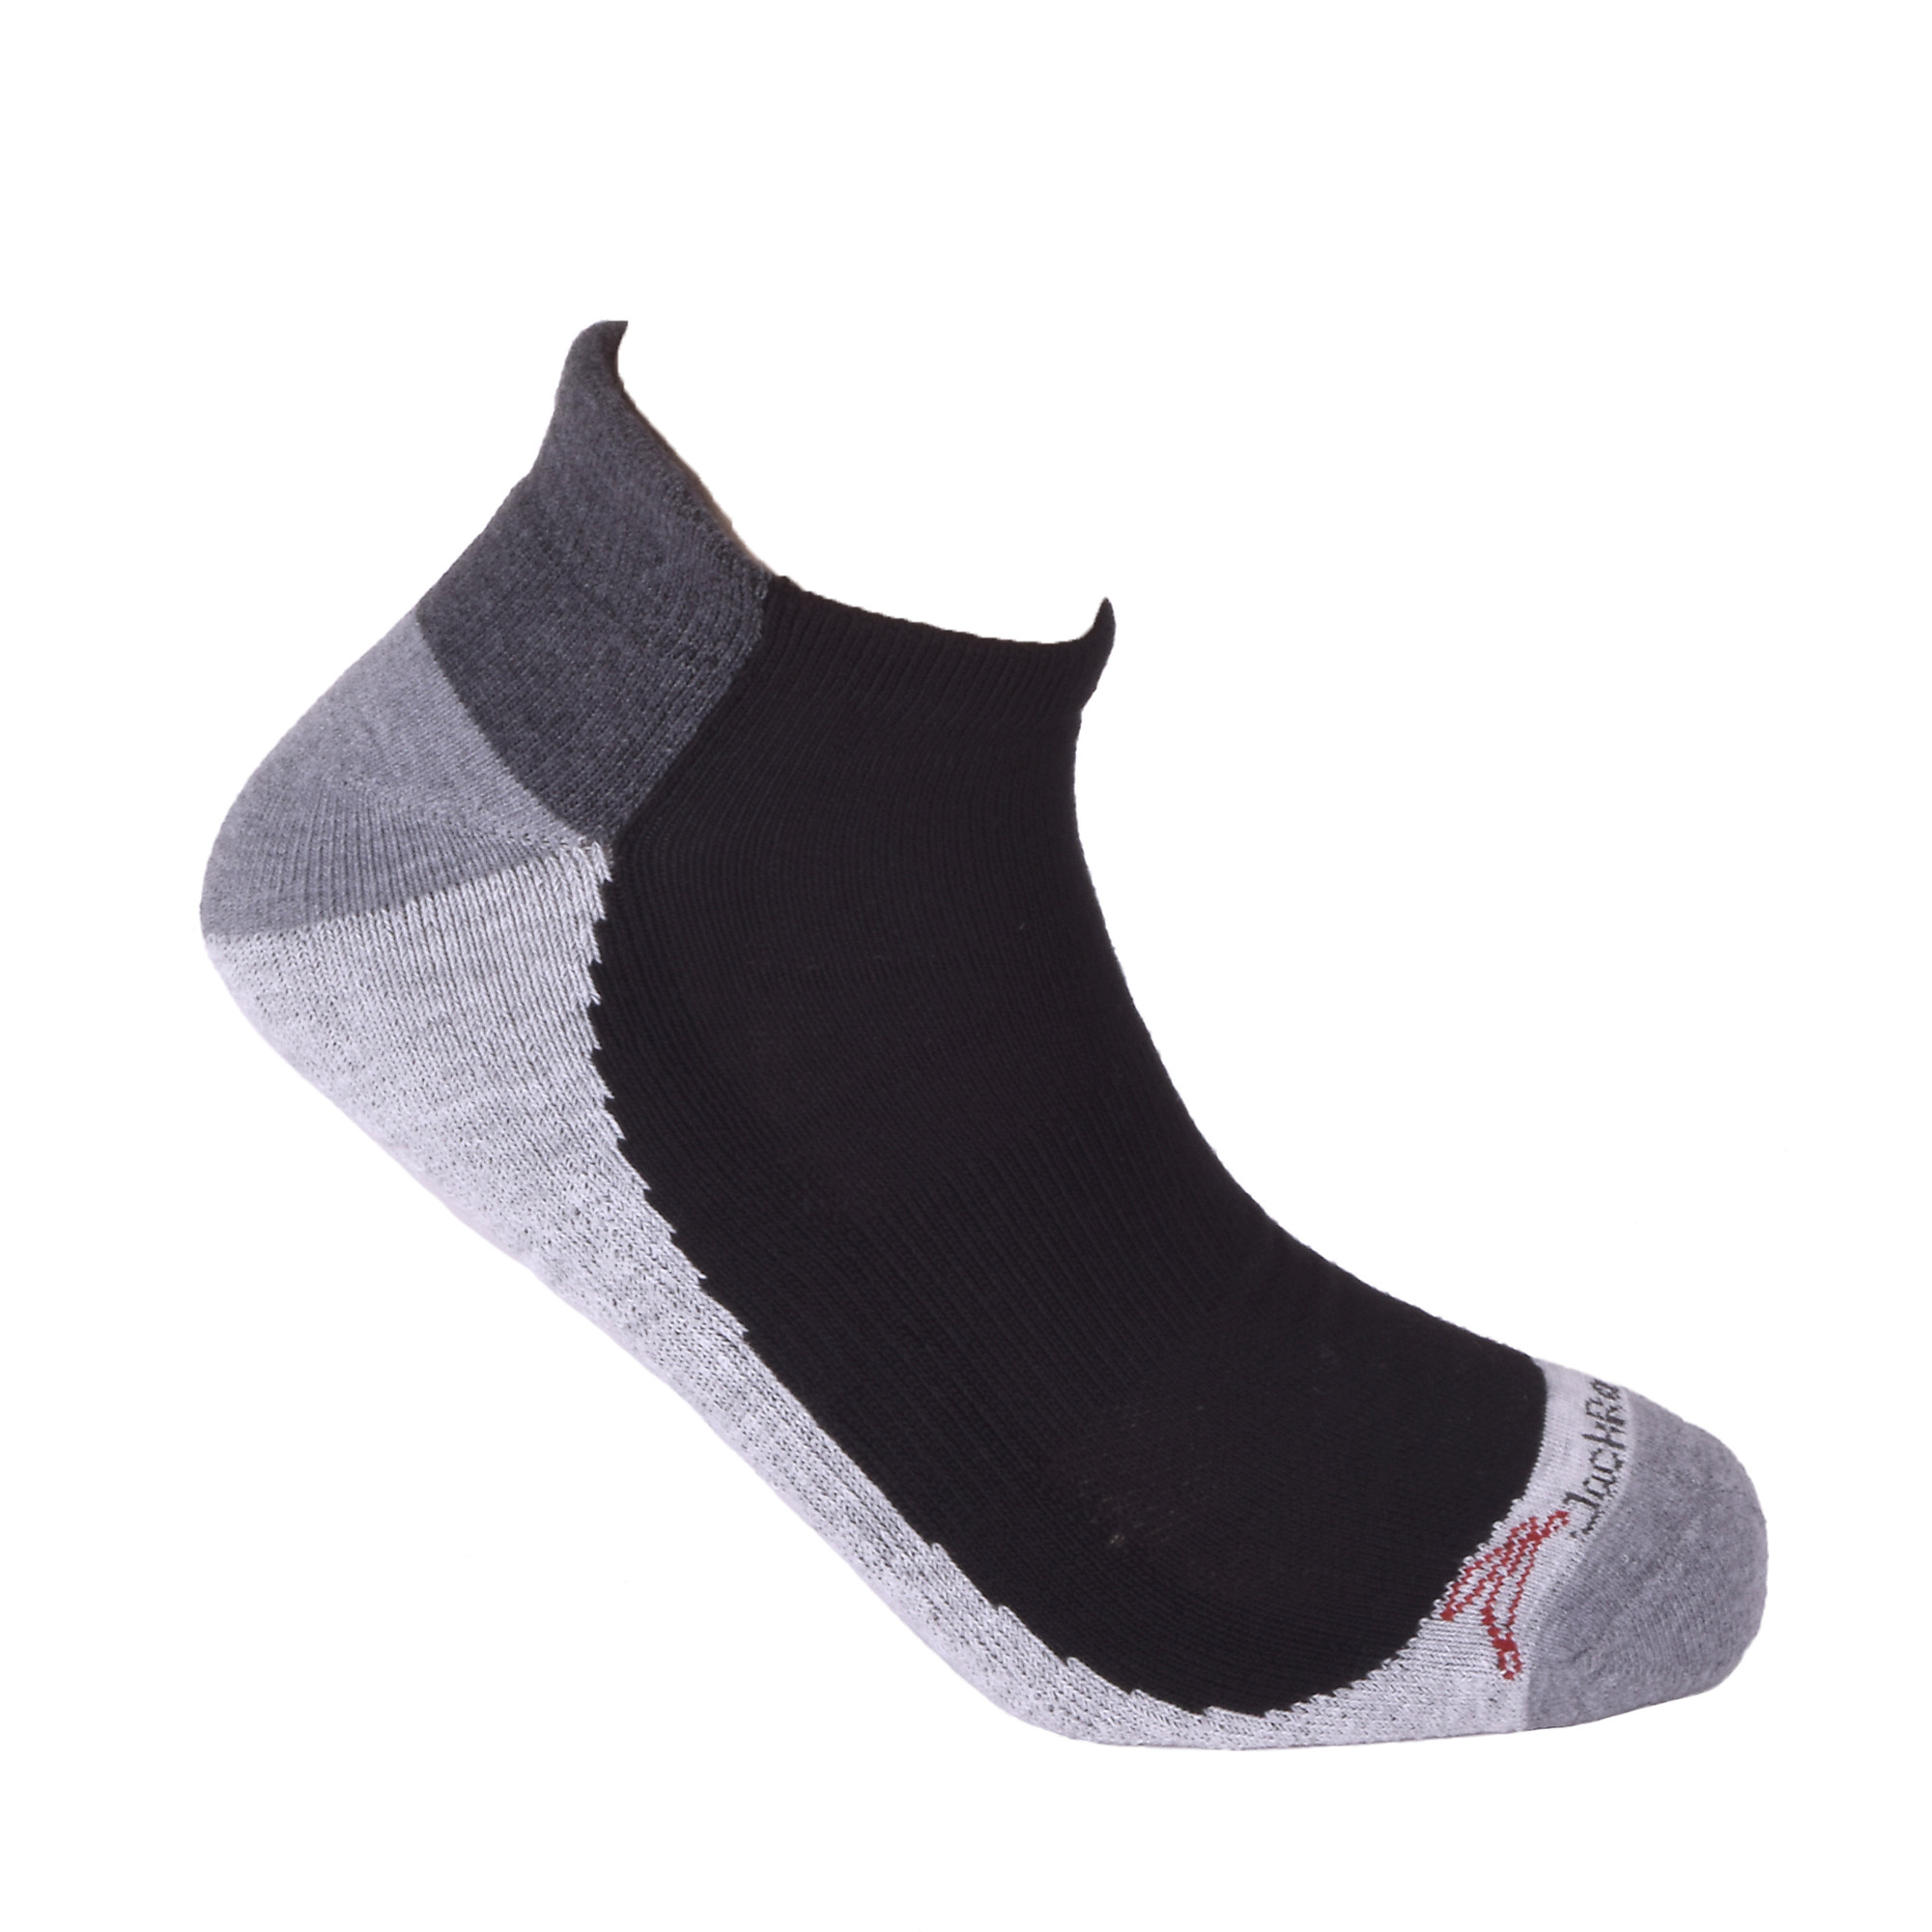 JackRabbit No Show Tab Cushion Performance Running Sock - Color: Black/Grey - Size: S, Black/Grey, large, image 3